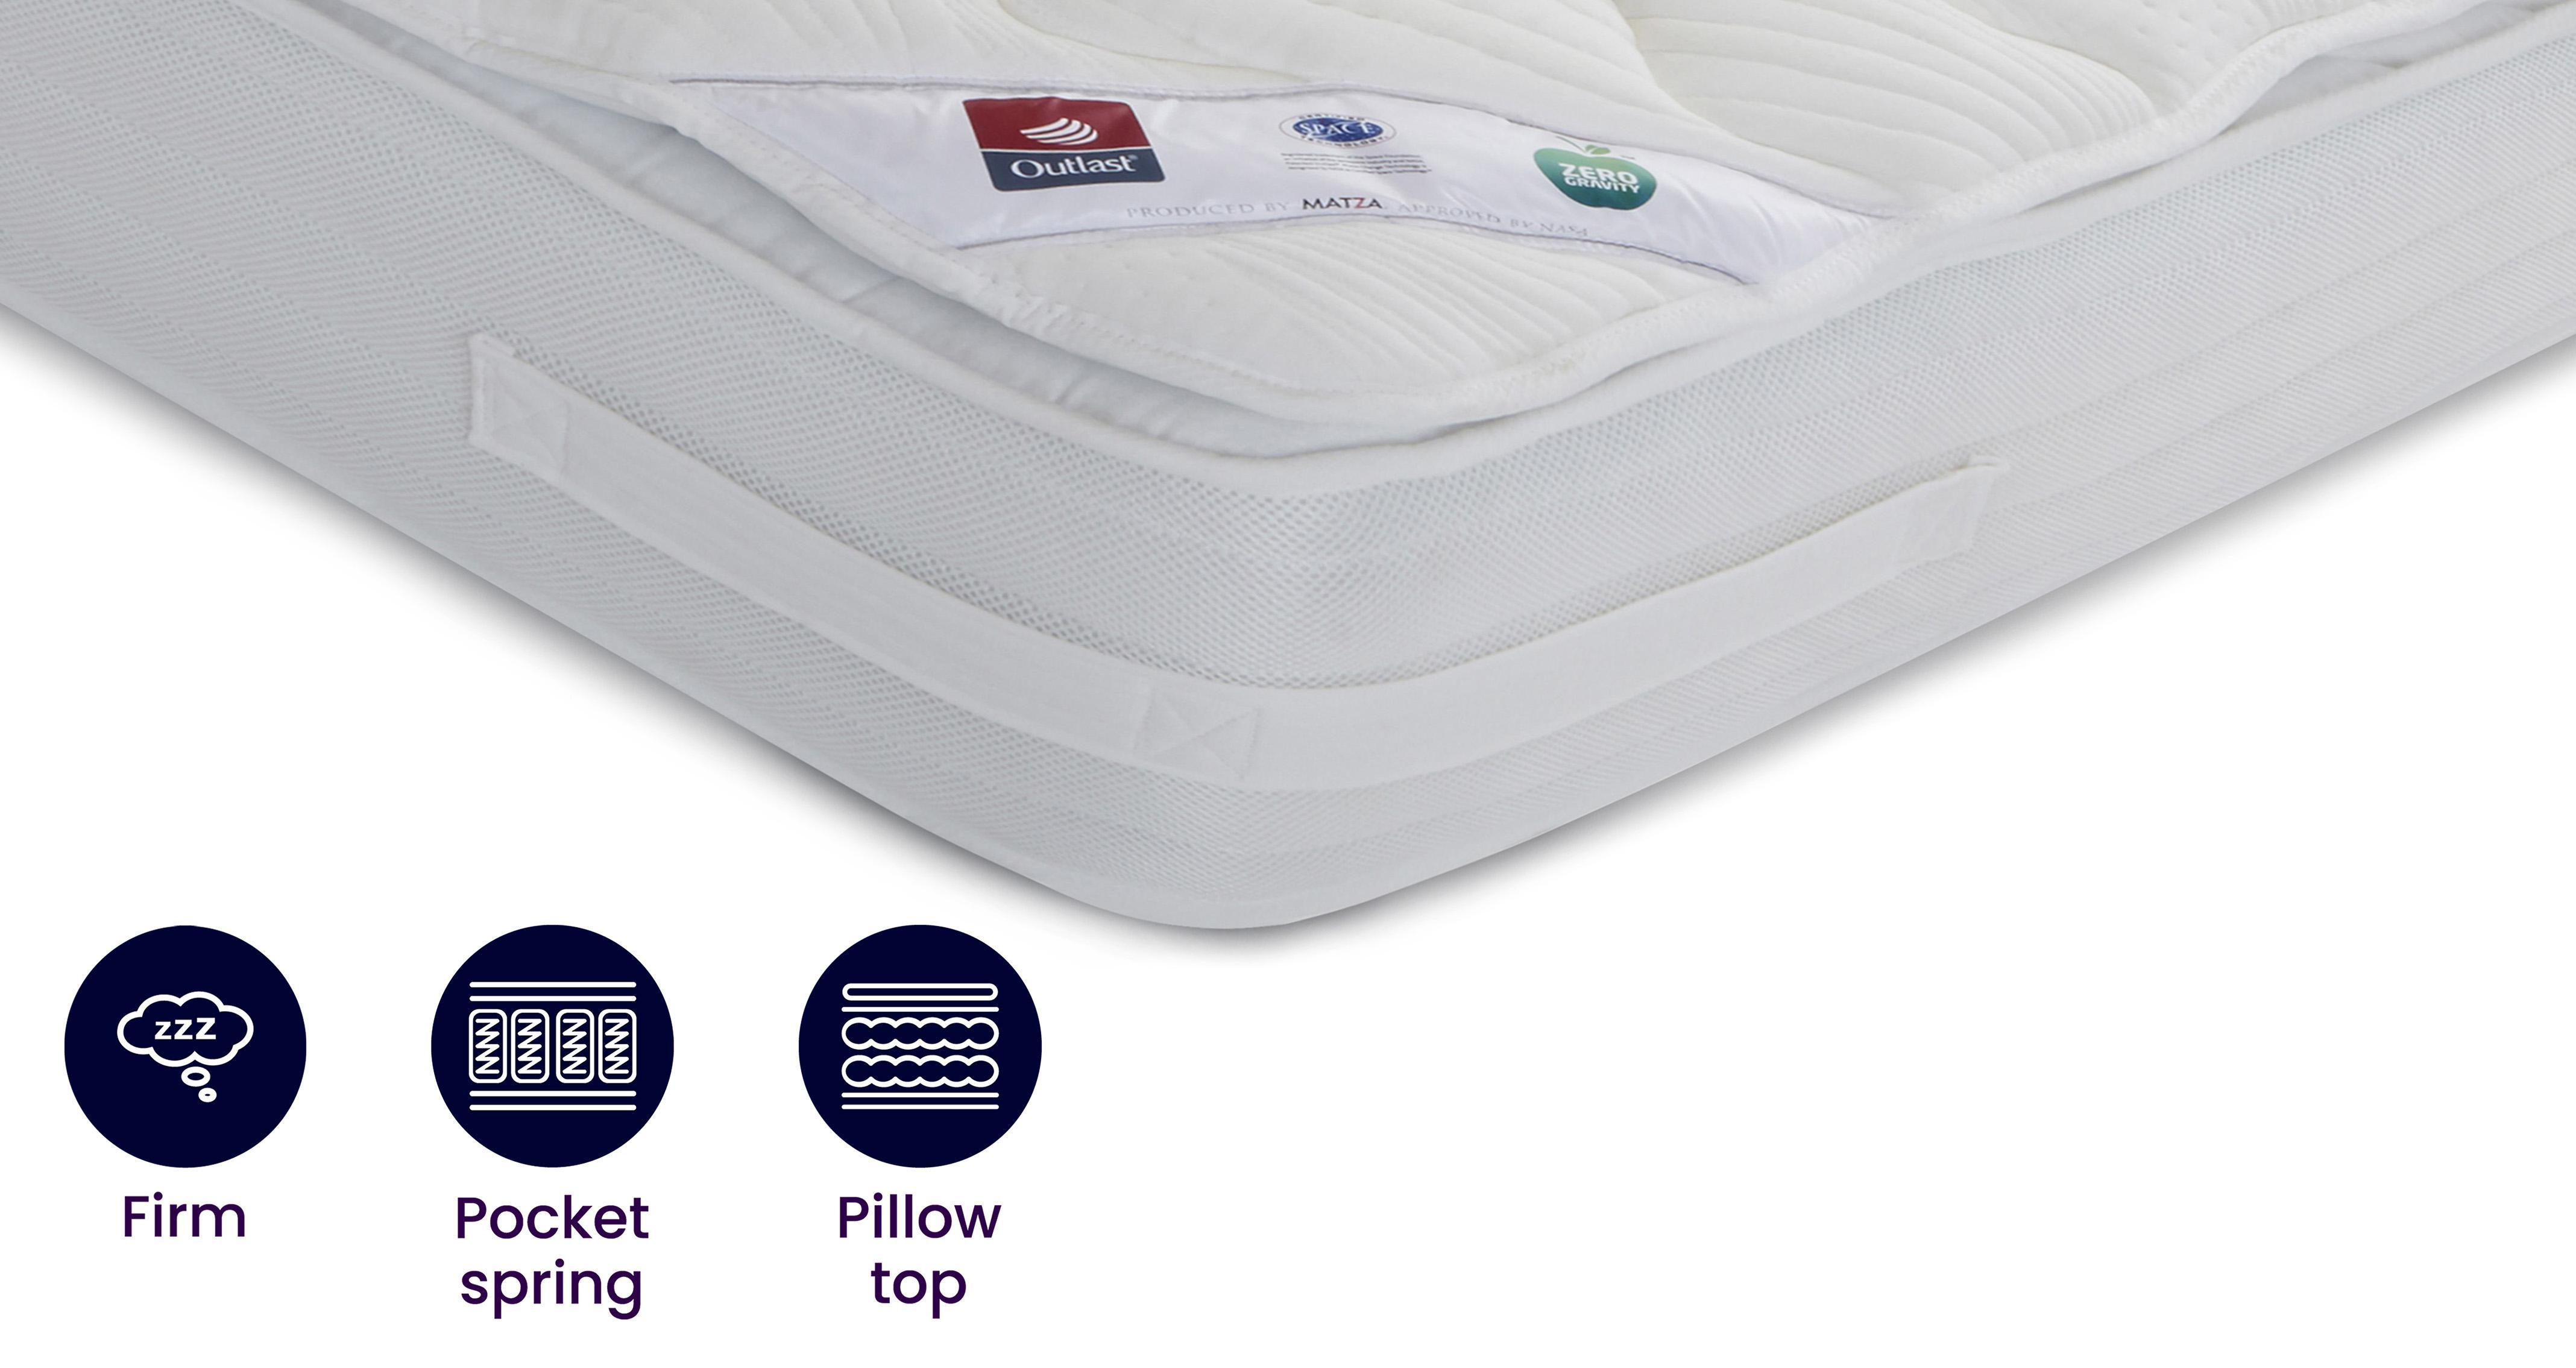 optimum 4000 mattress king 5 ft mattress optimum dfs. Black Bedroom Furniture Sets. Home Design Ideas